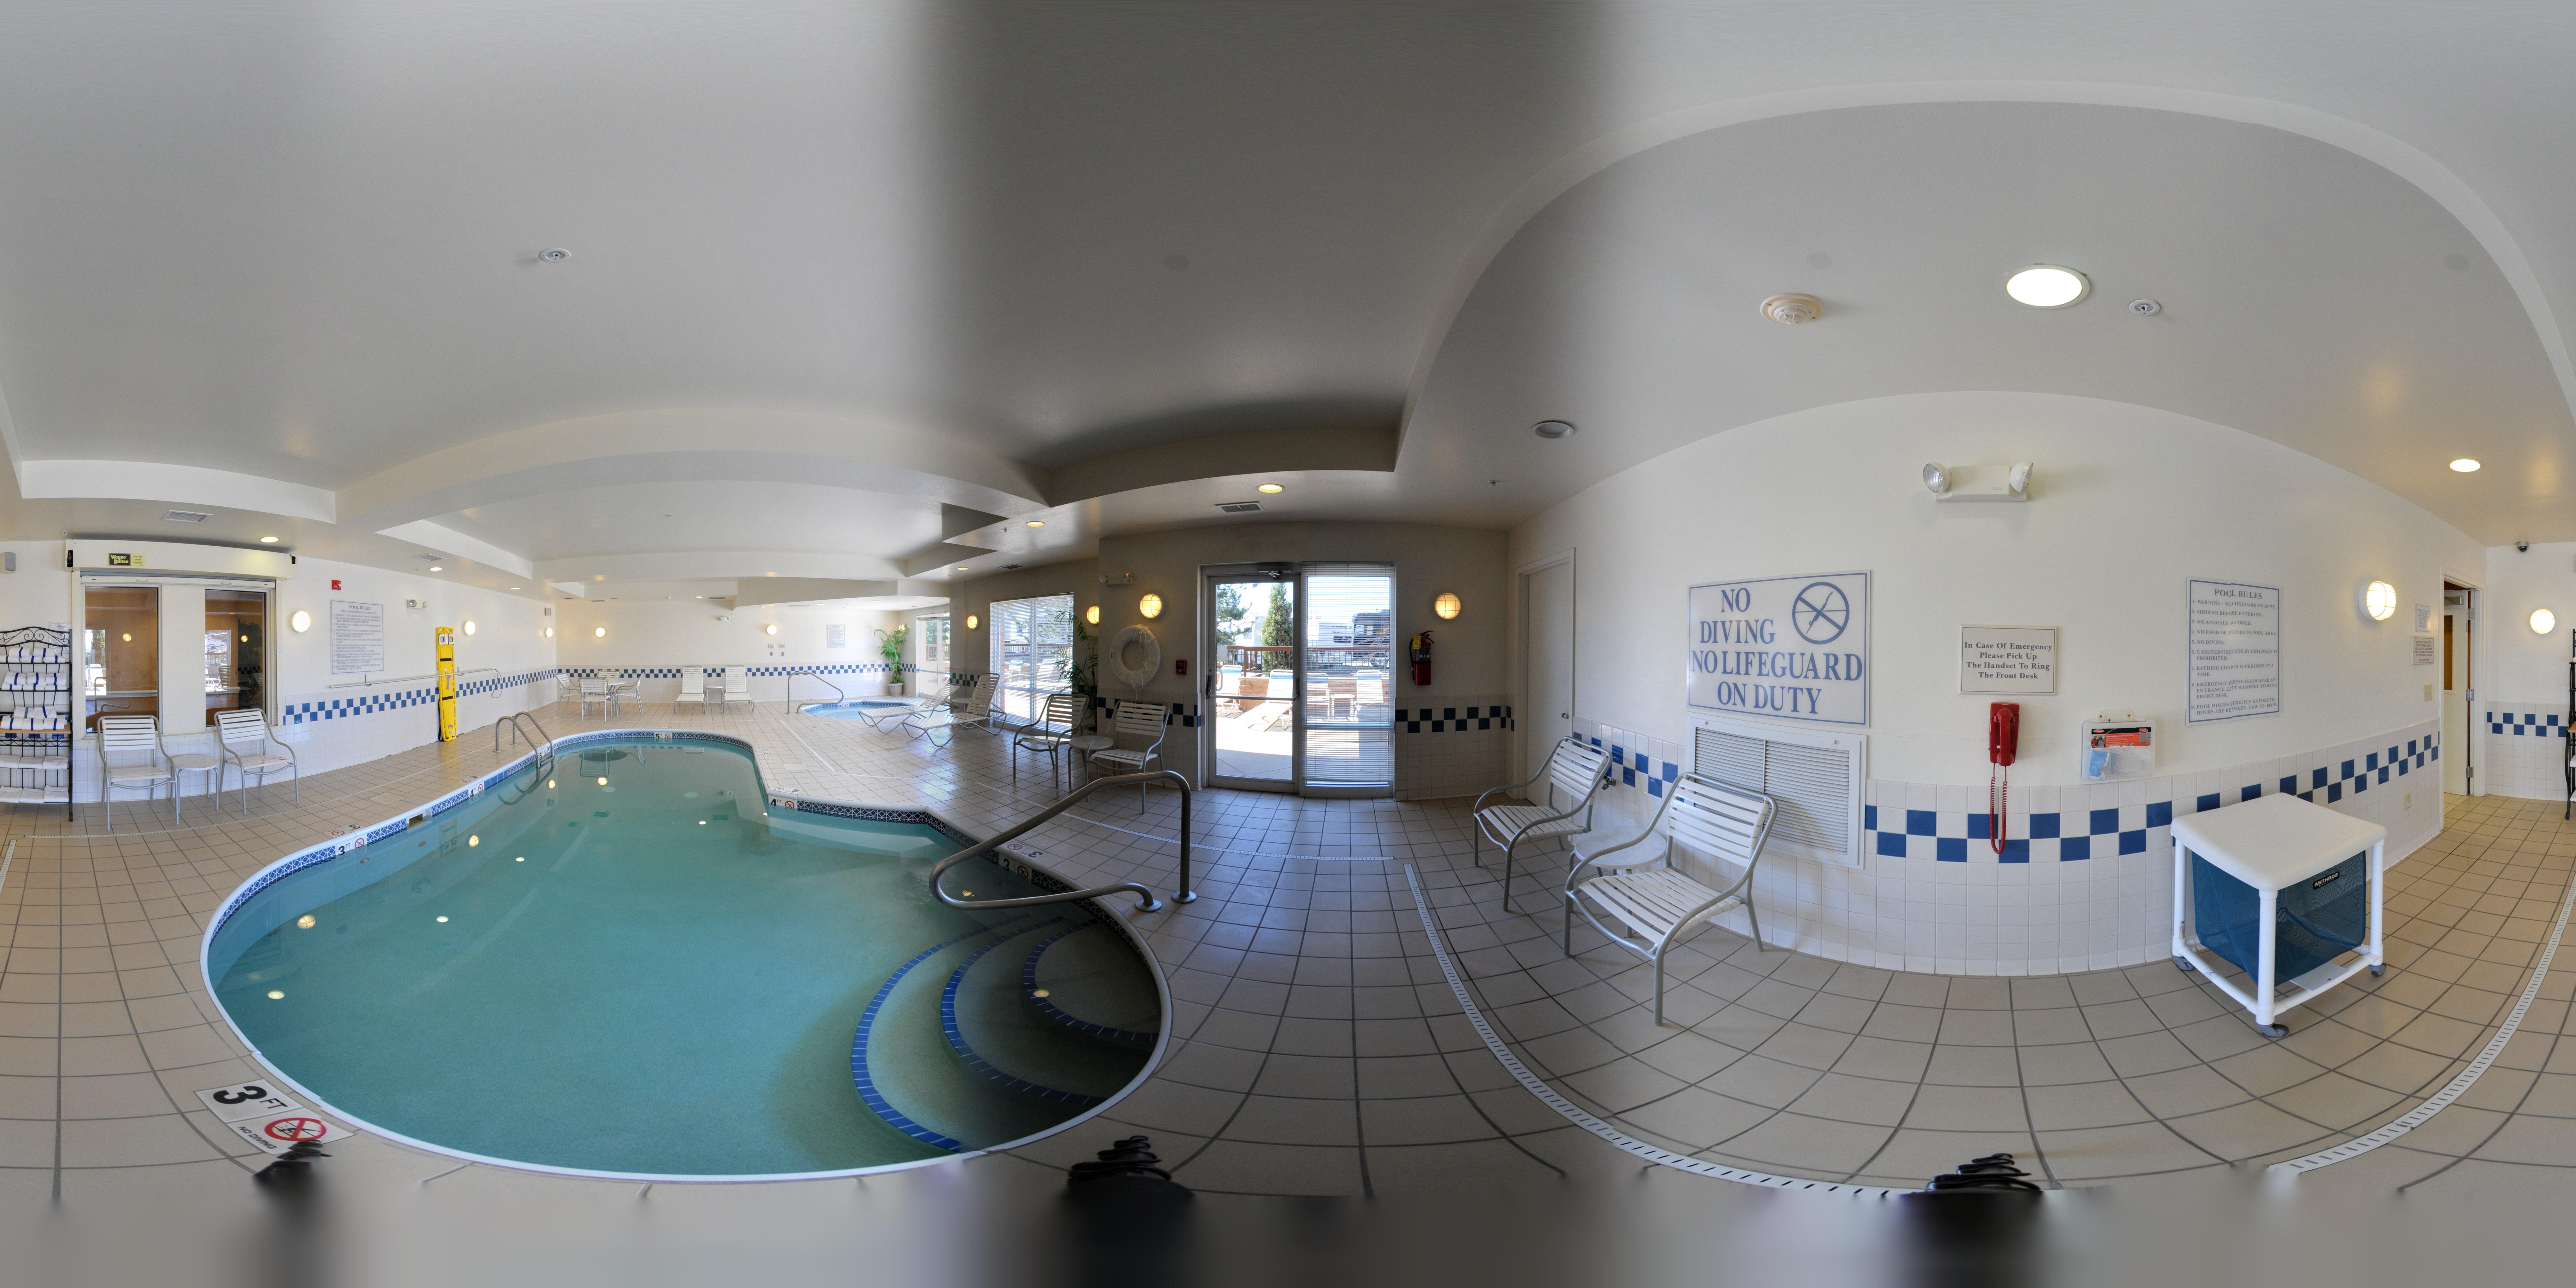 Fairfield Inn & Suites by Marriott Akron South image 34